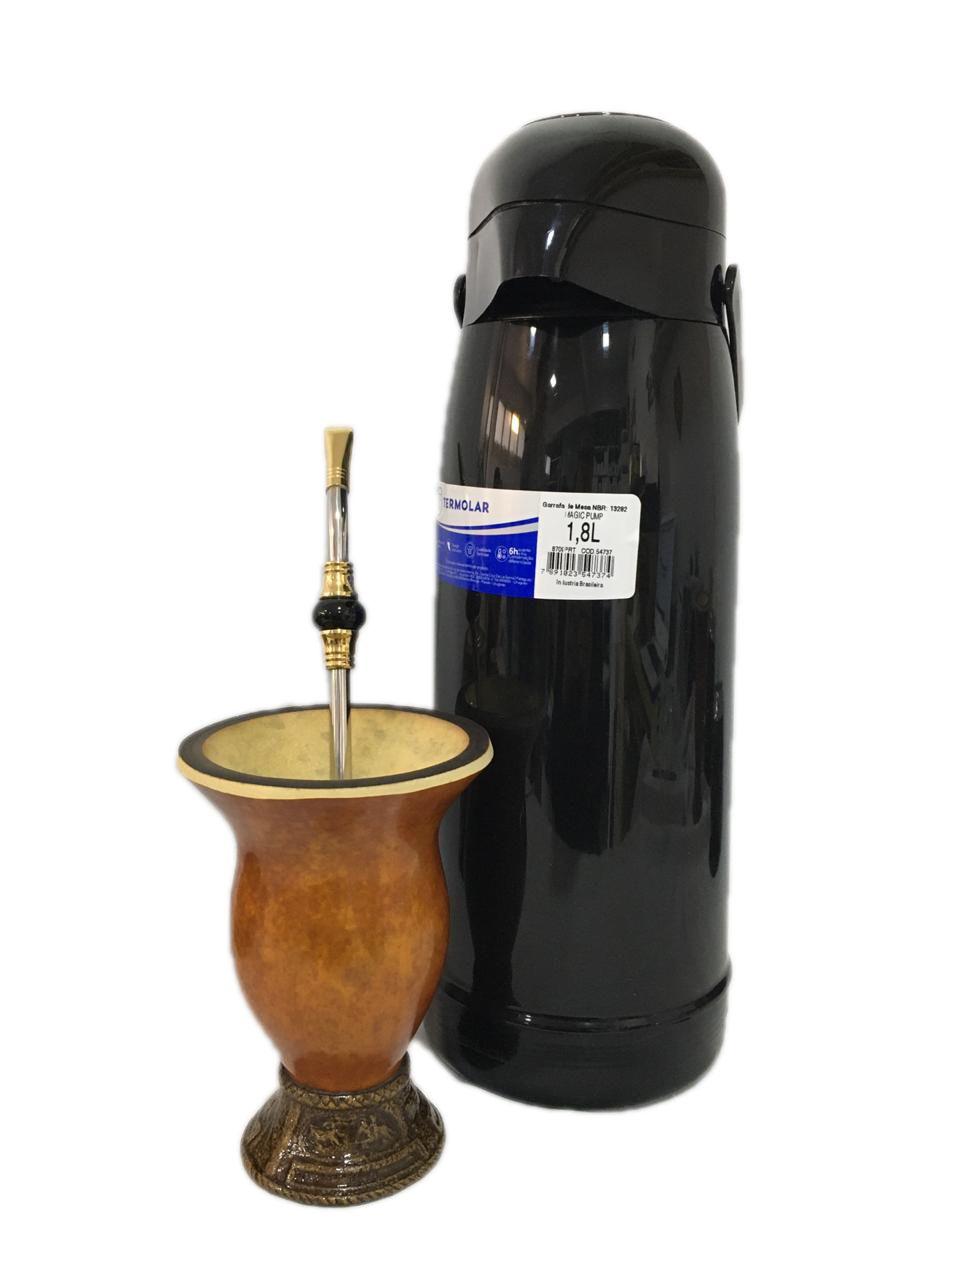 Kit chimarrão Cuia porongo bomba inox pedra e Garrafa Térmica termolar 1,8 L